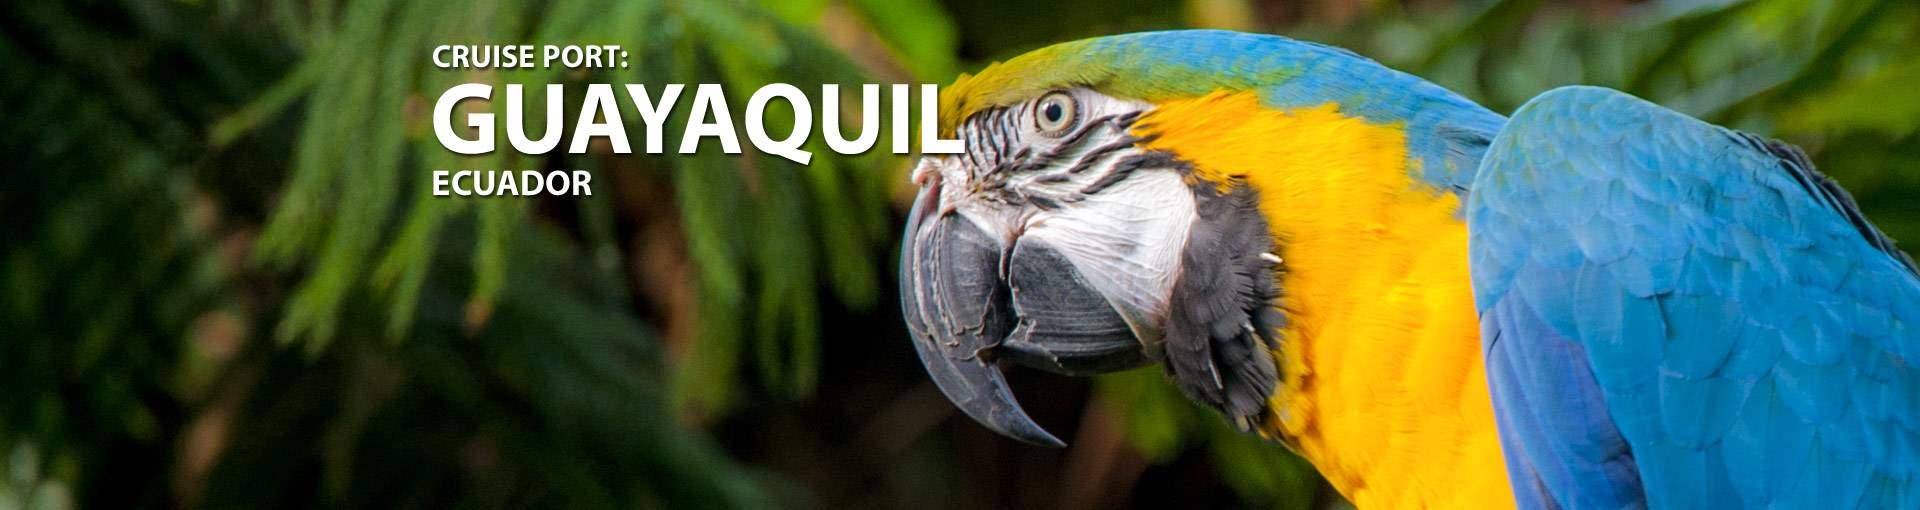 Cruises from Guayaquil, Ecuador